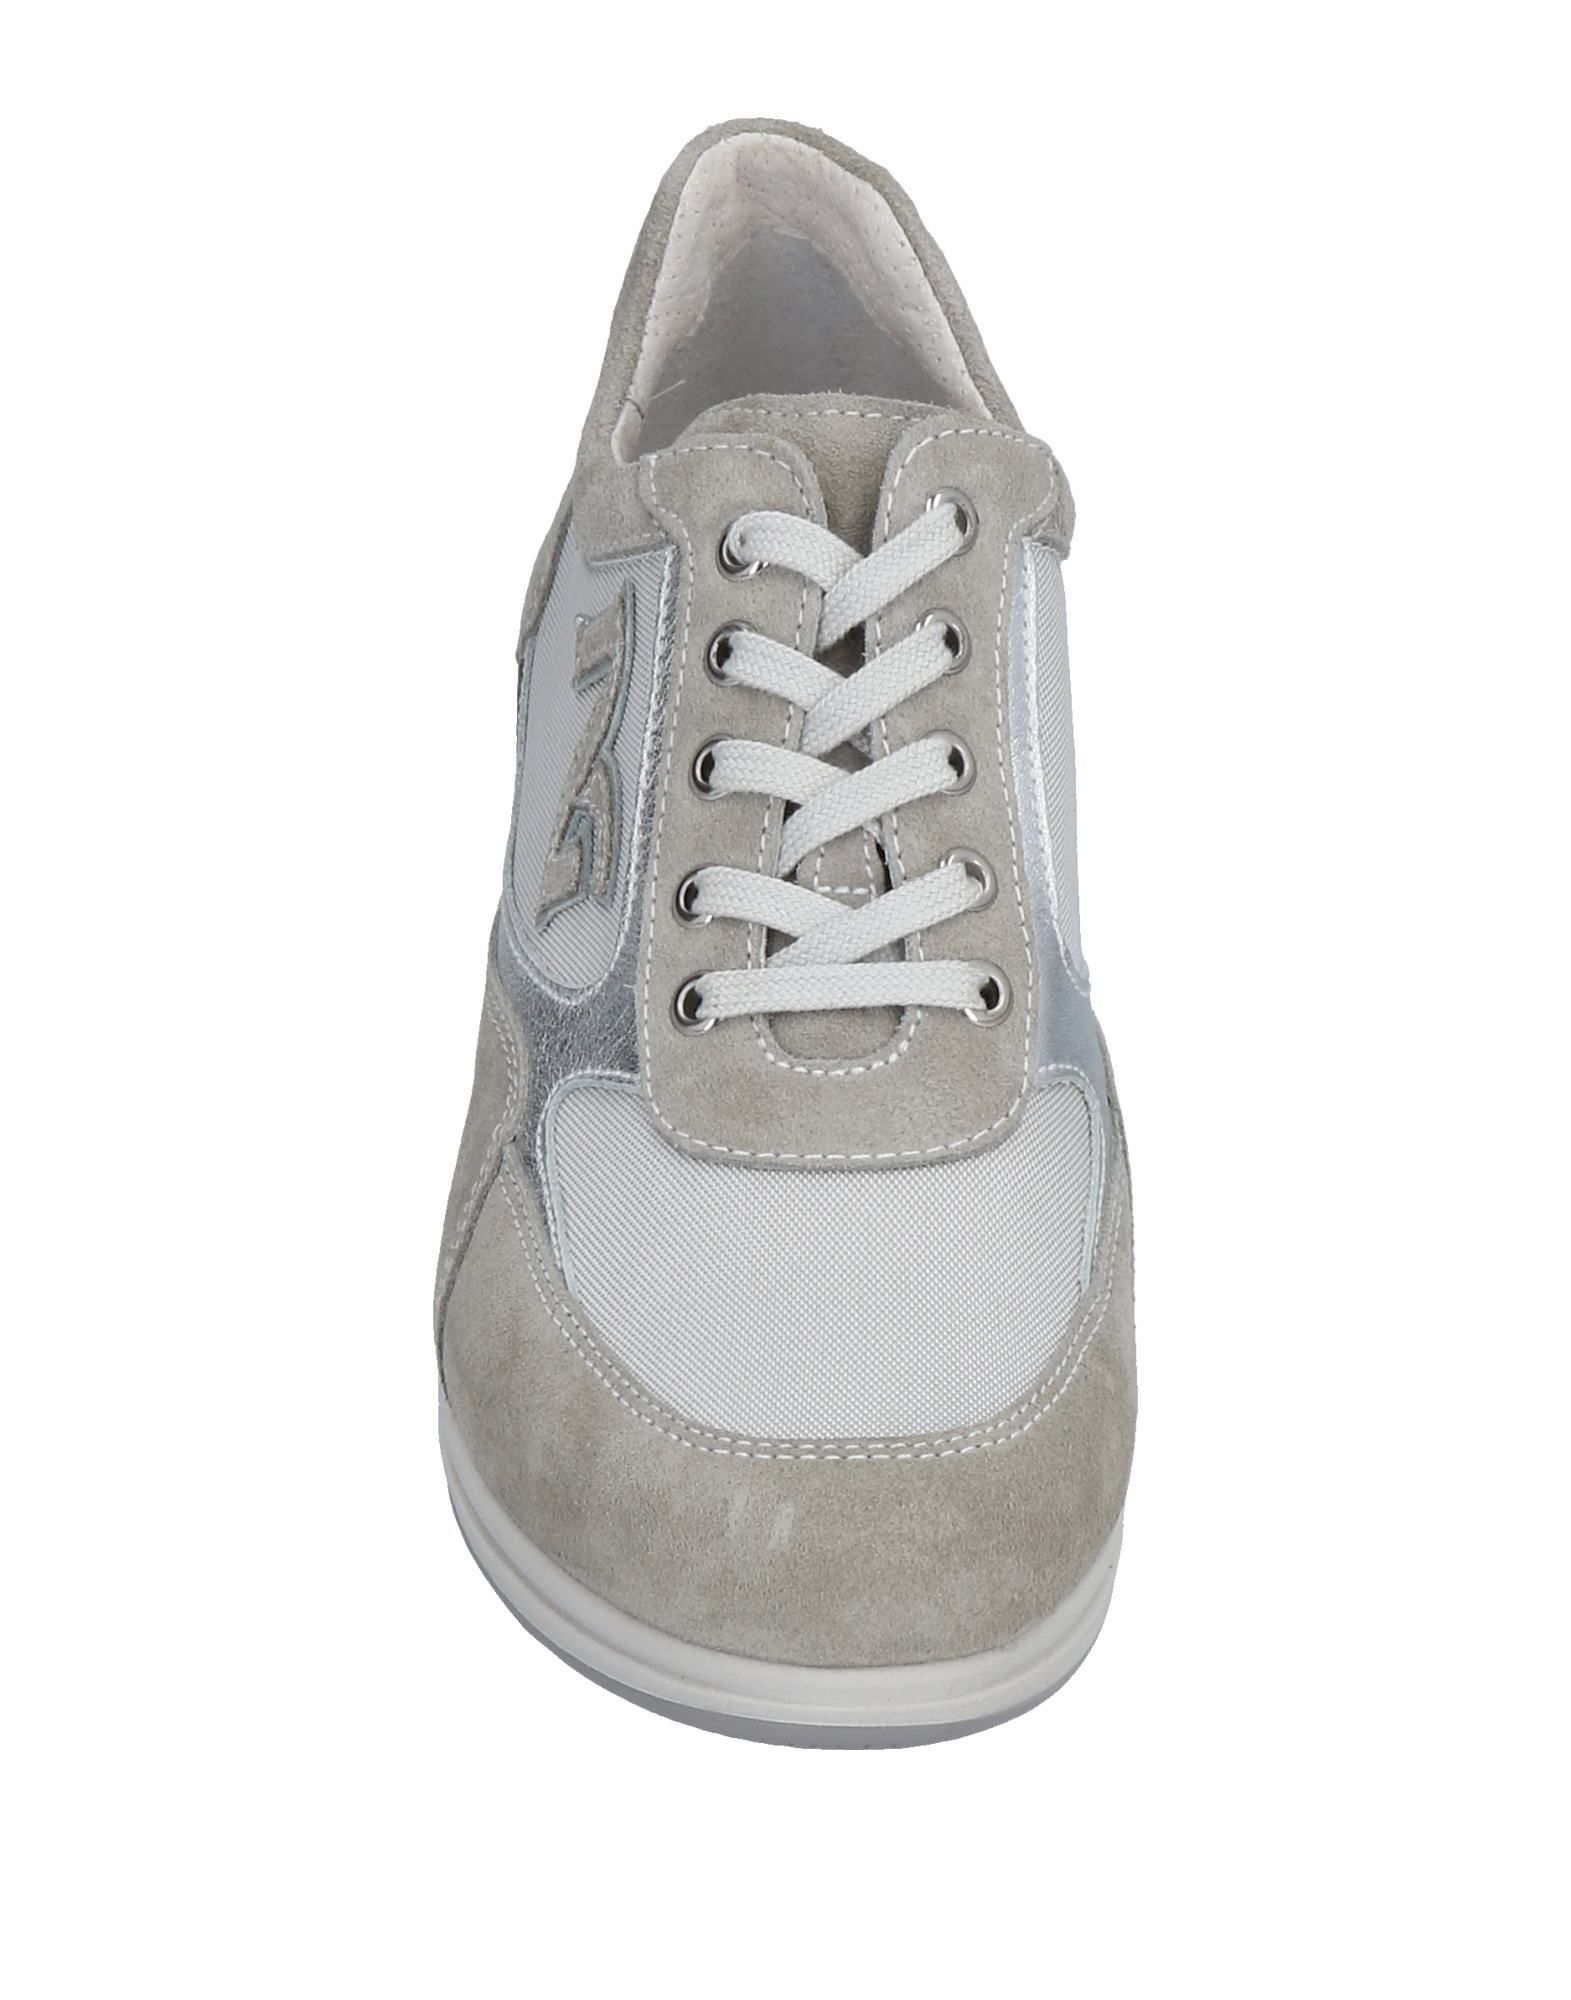 Nero Giardini Sneakers Damen beliebte  11484049WT Gute Qualität beliebte Damen Schuhe 2c15c3